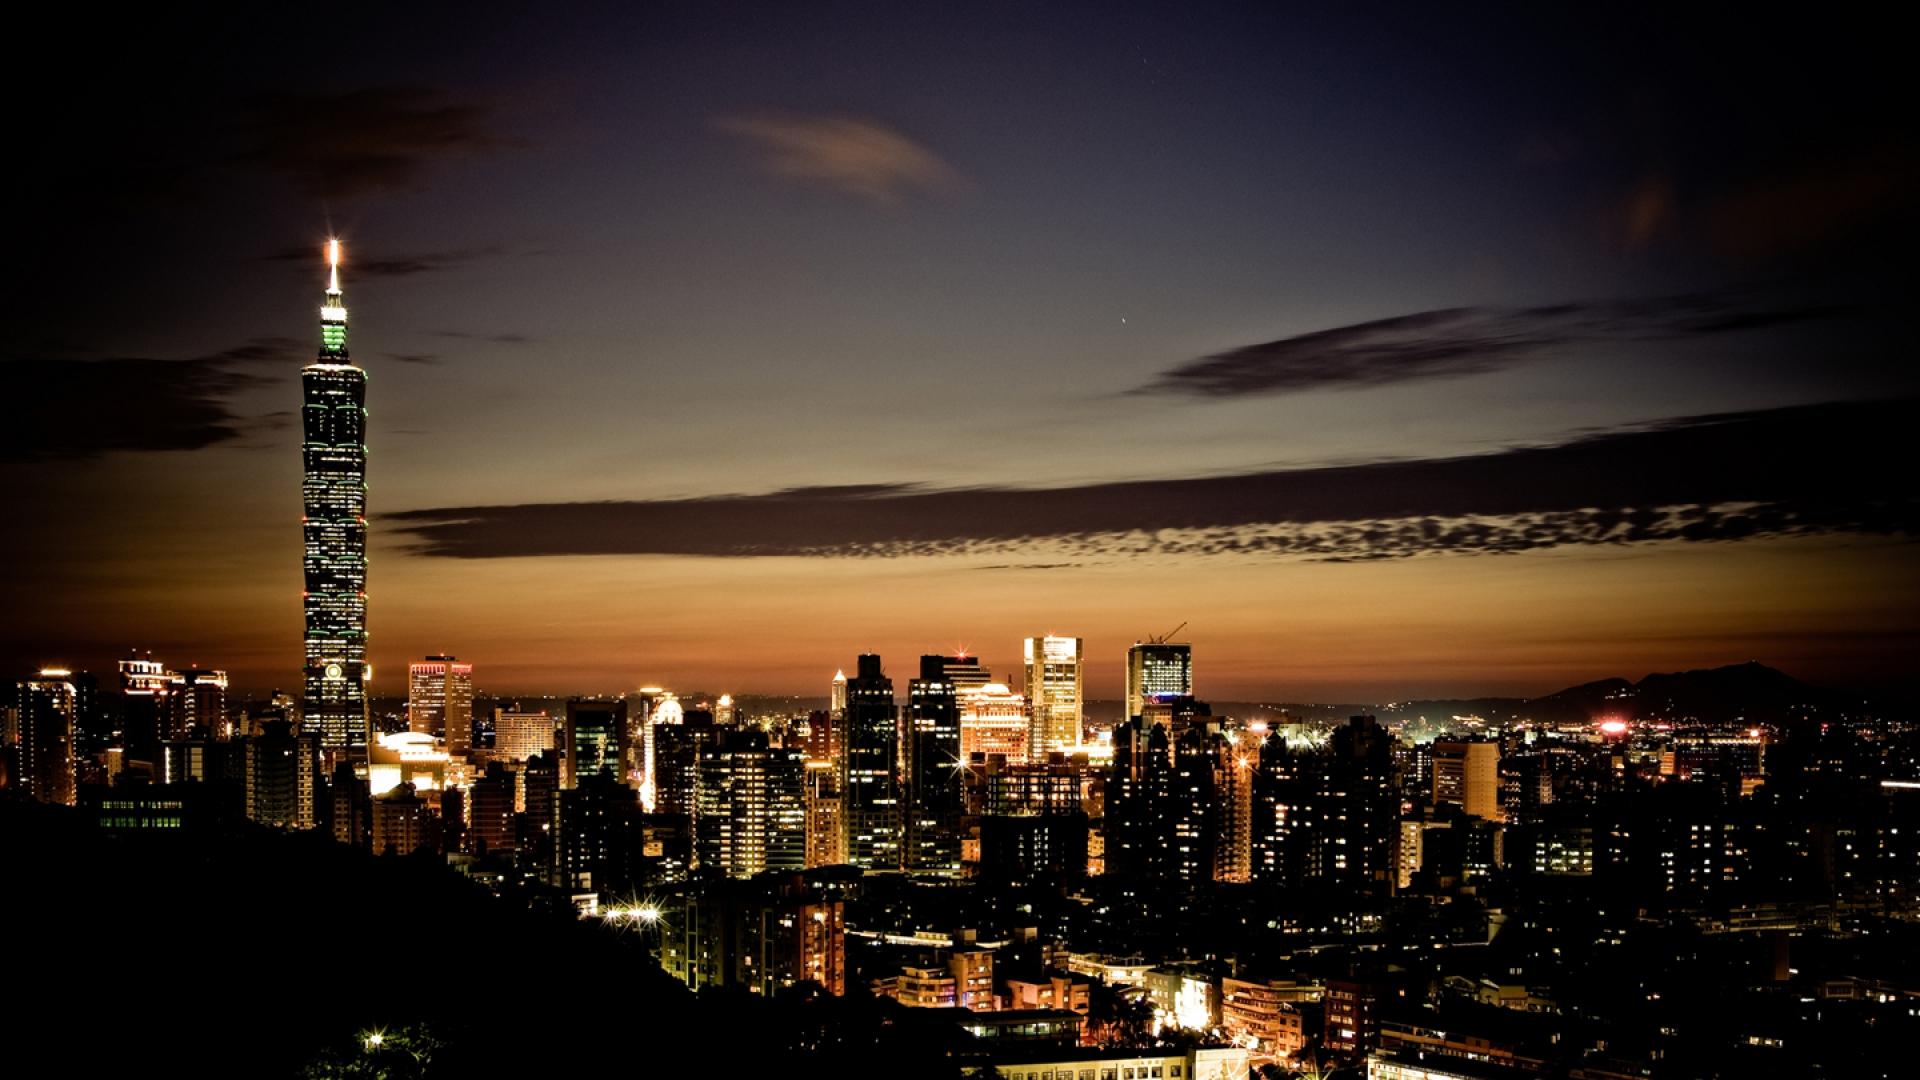 Download night time city wallpaper HD wallpaper 1920x1080